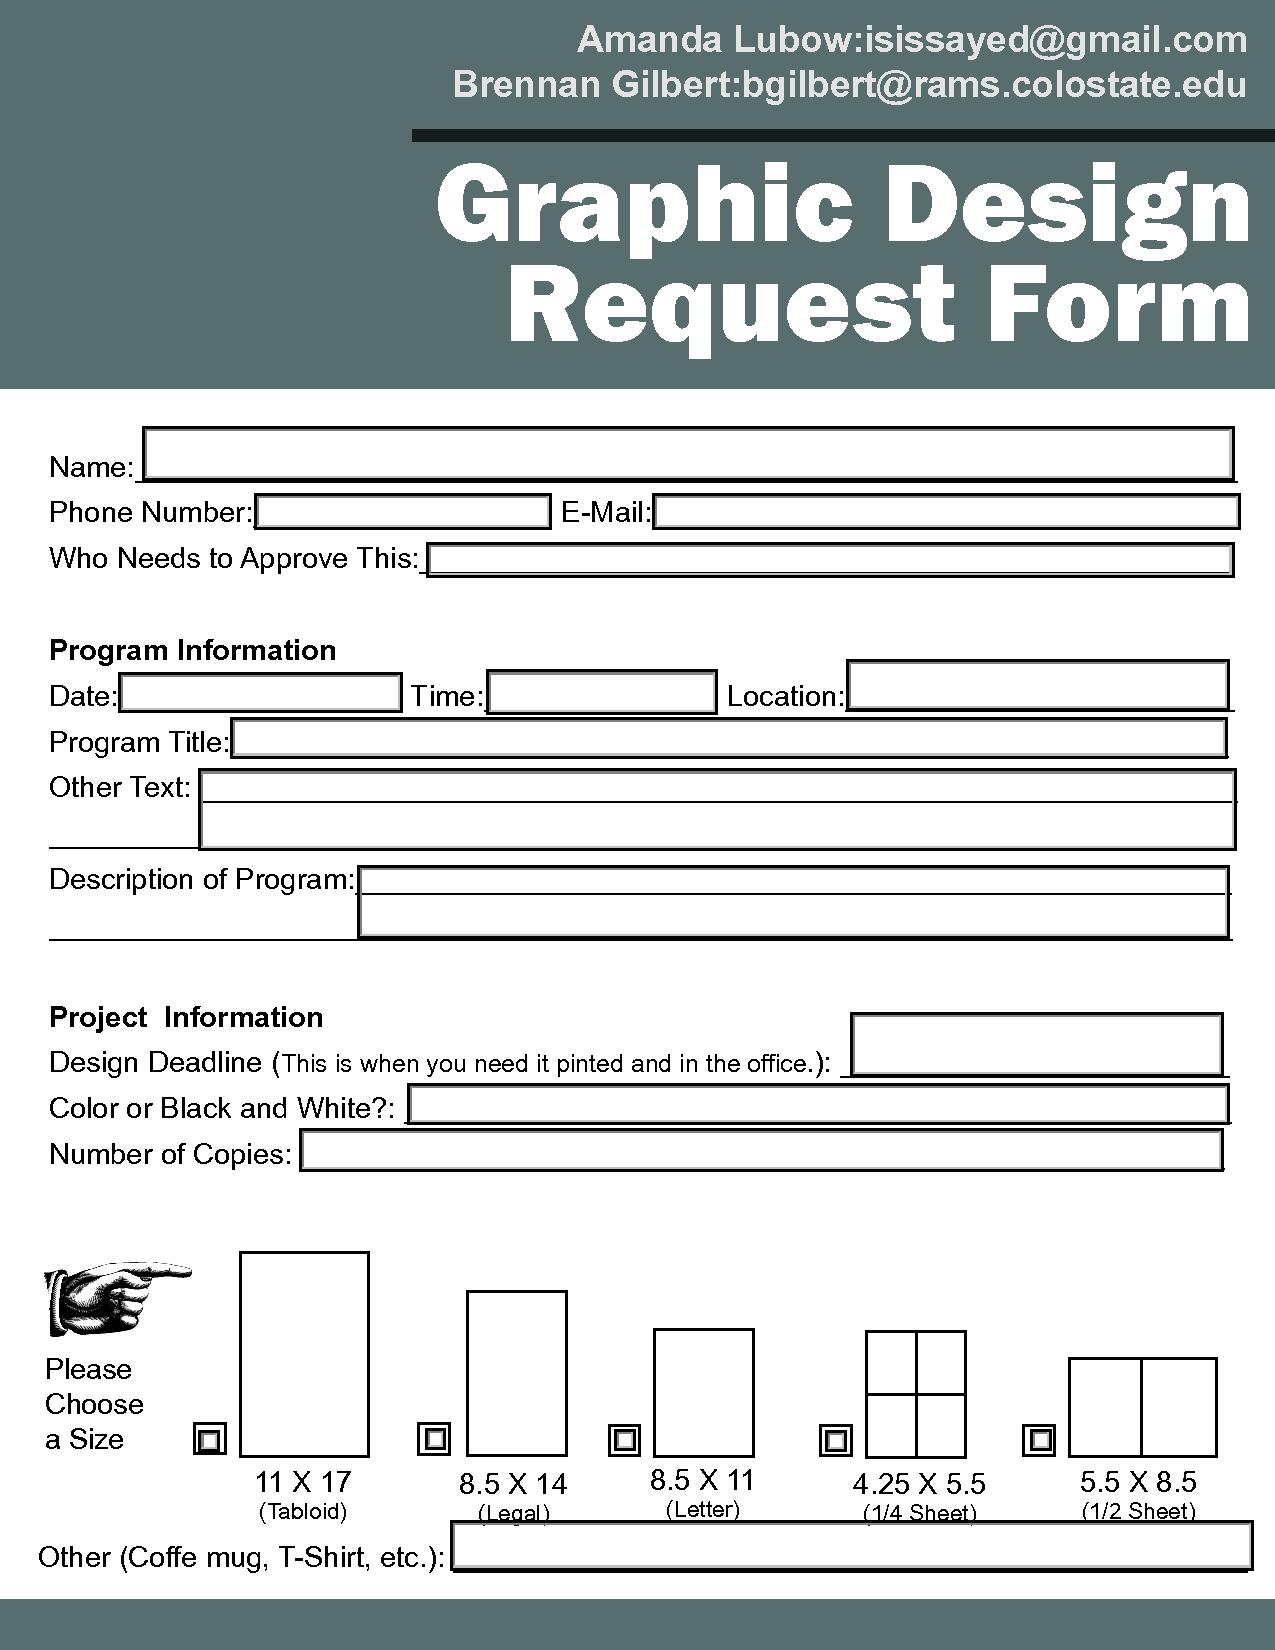 Graphic Design Request Form Template | Design Briefs | Pinterest ...